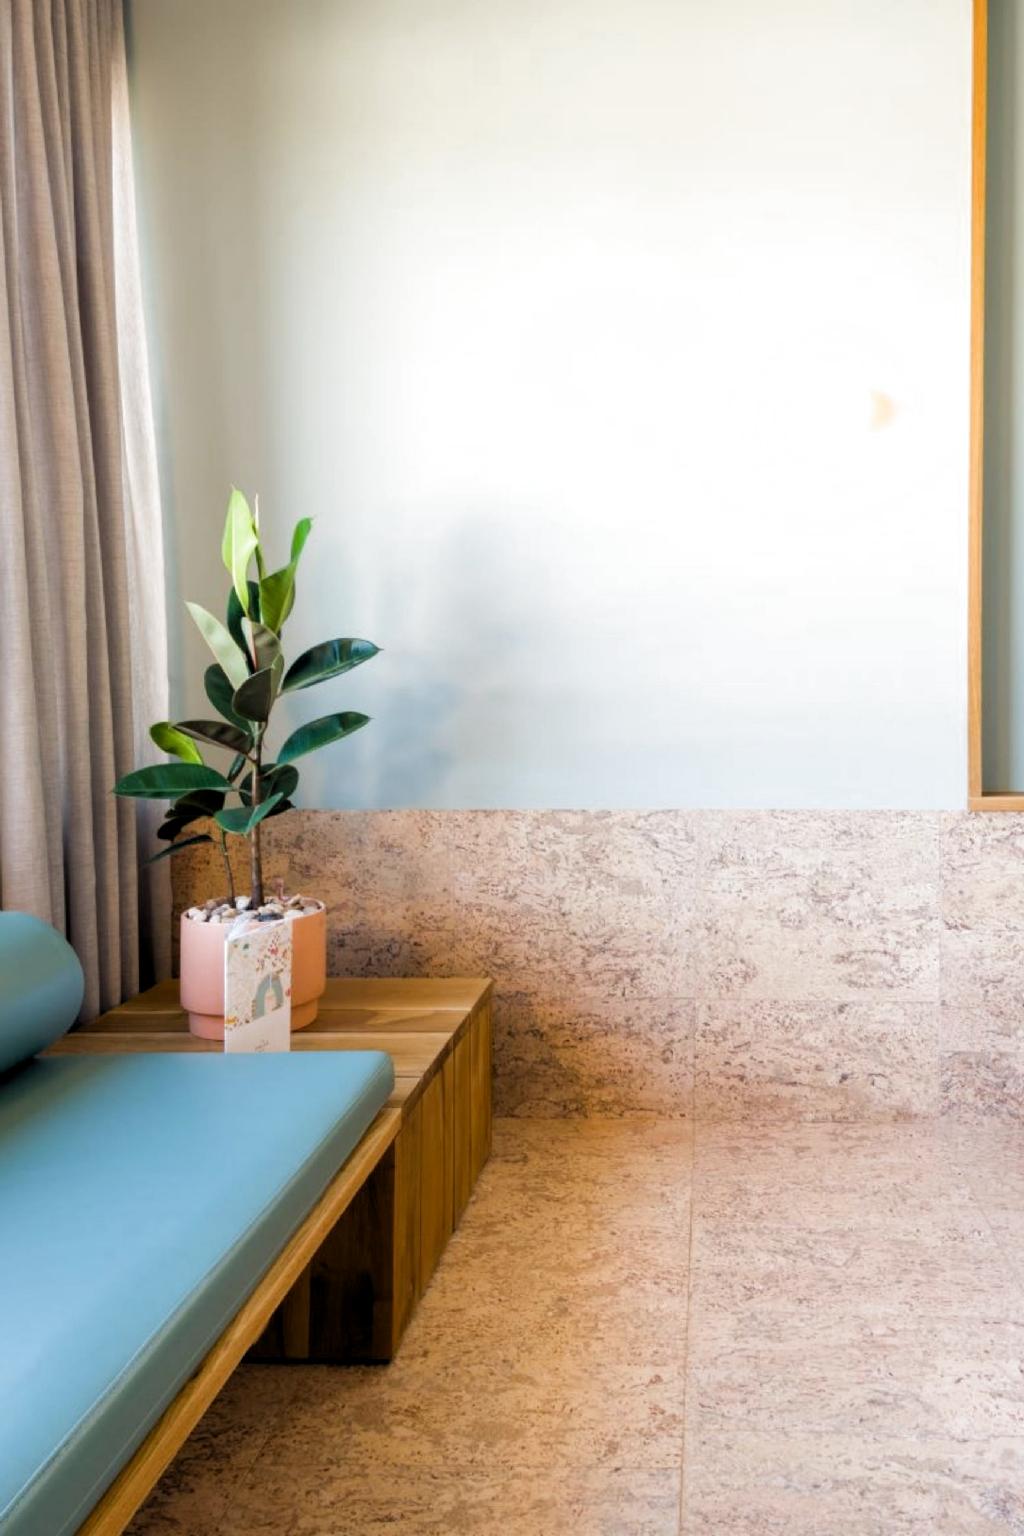 White Bathroom With Hexagonal Cork Flooring In 2020 Cork Flooring Bathroom Cork Flooring Natural Cork Flooring